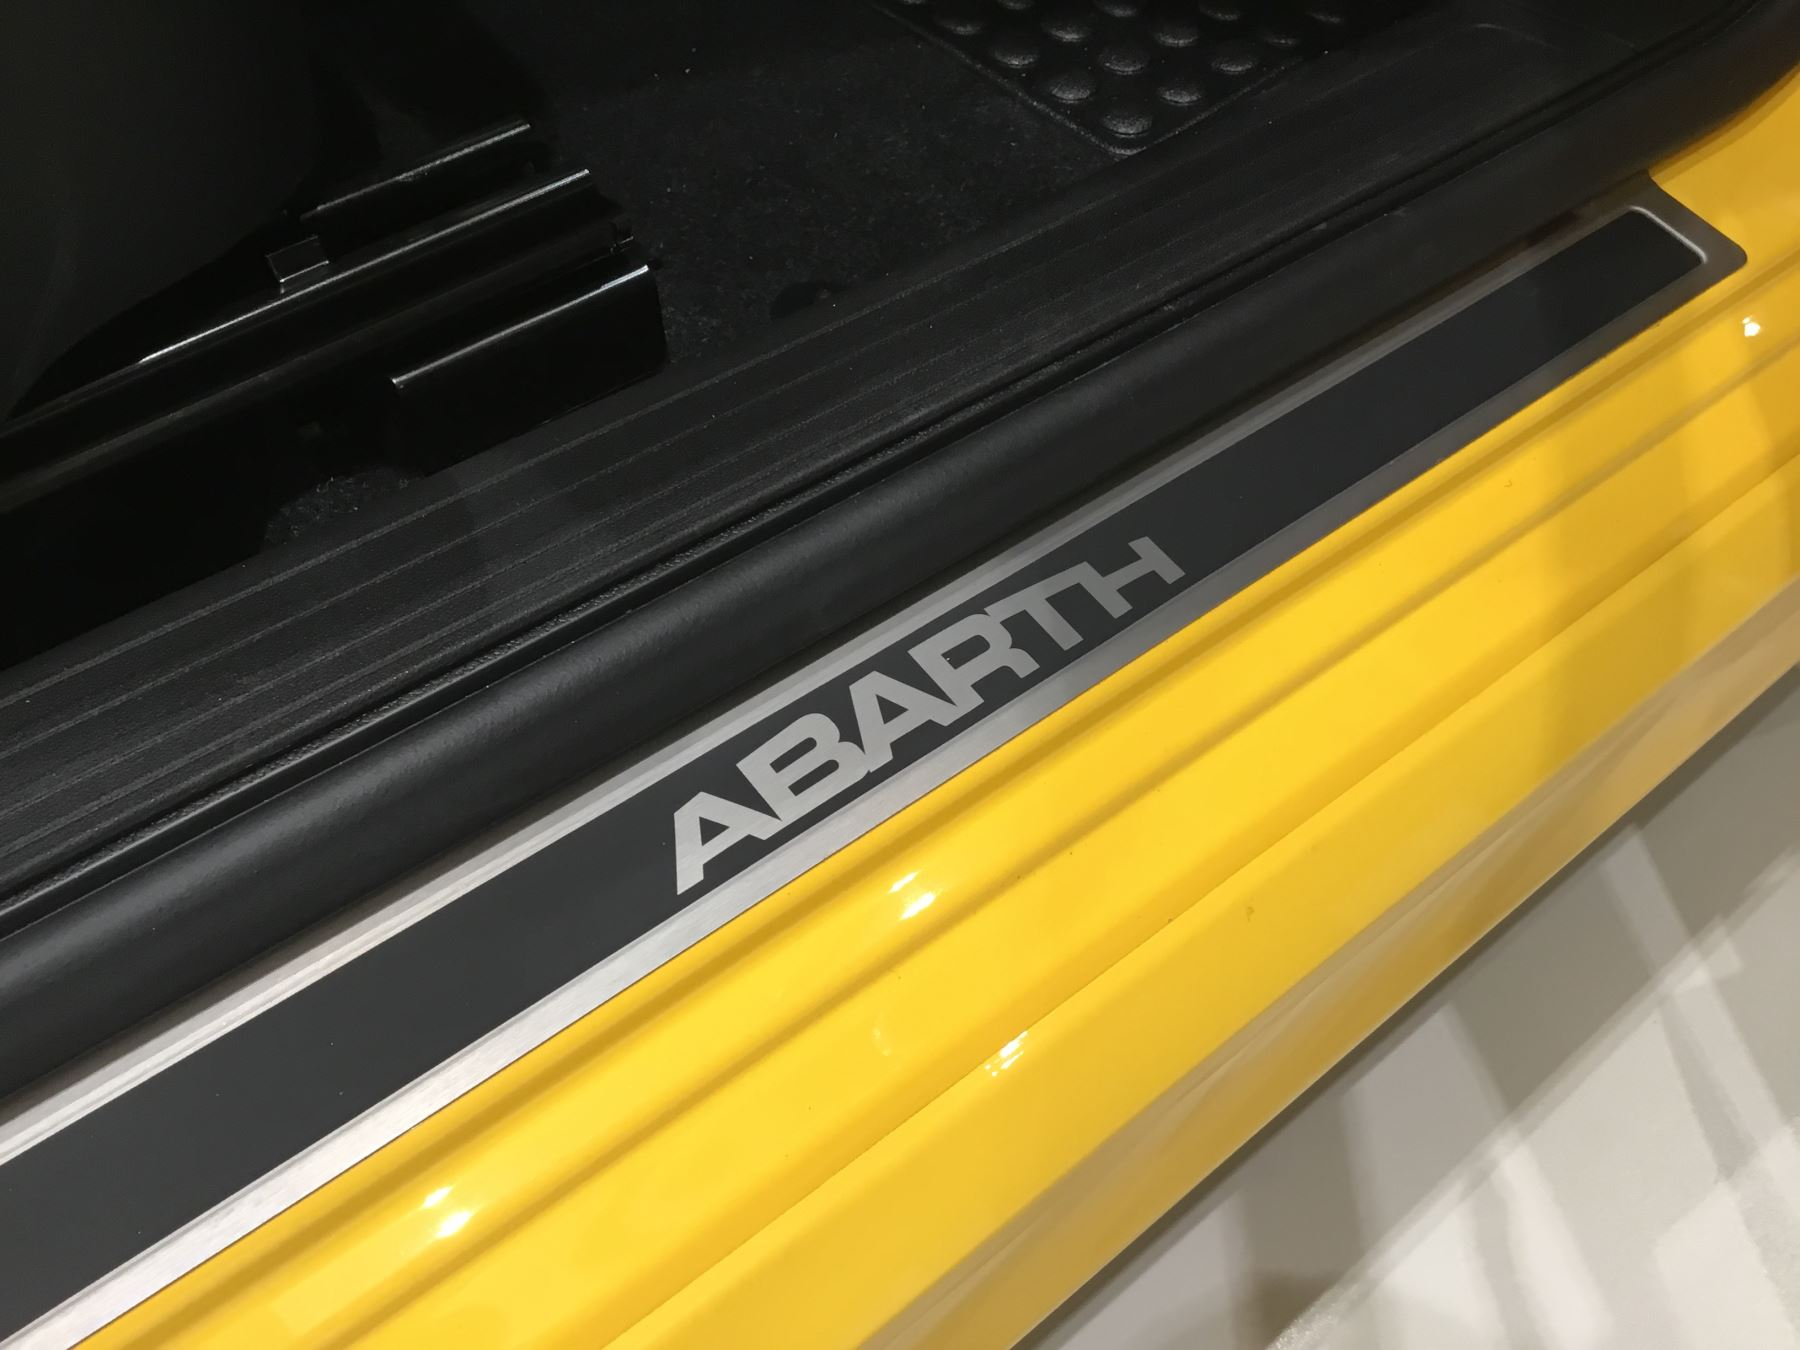 Abarth 595 1.4 T-Jet 145 3dr image 13